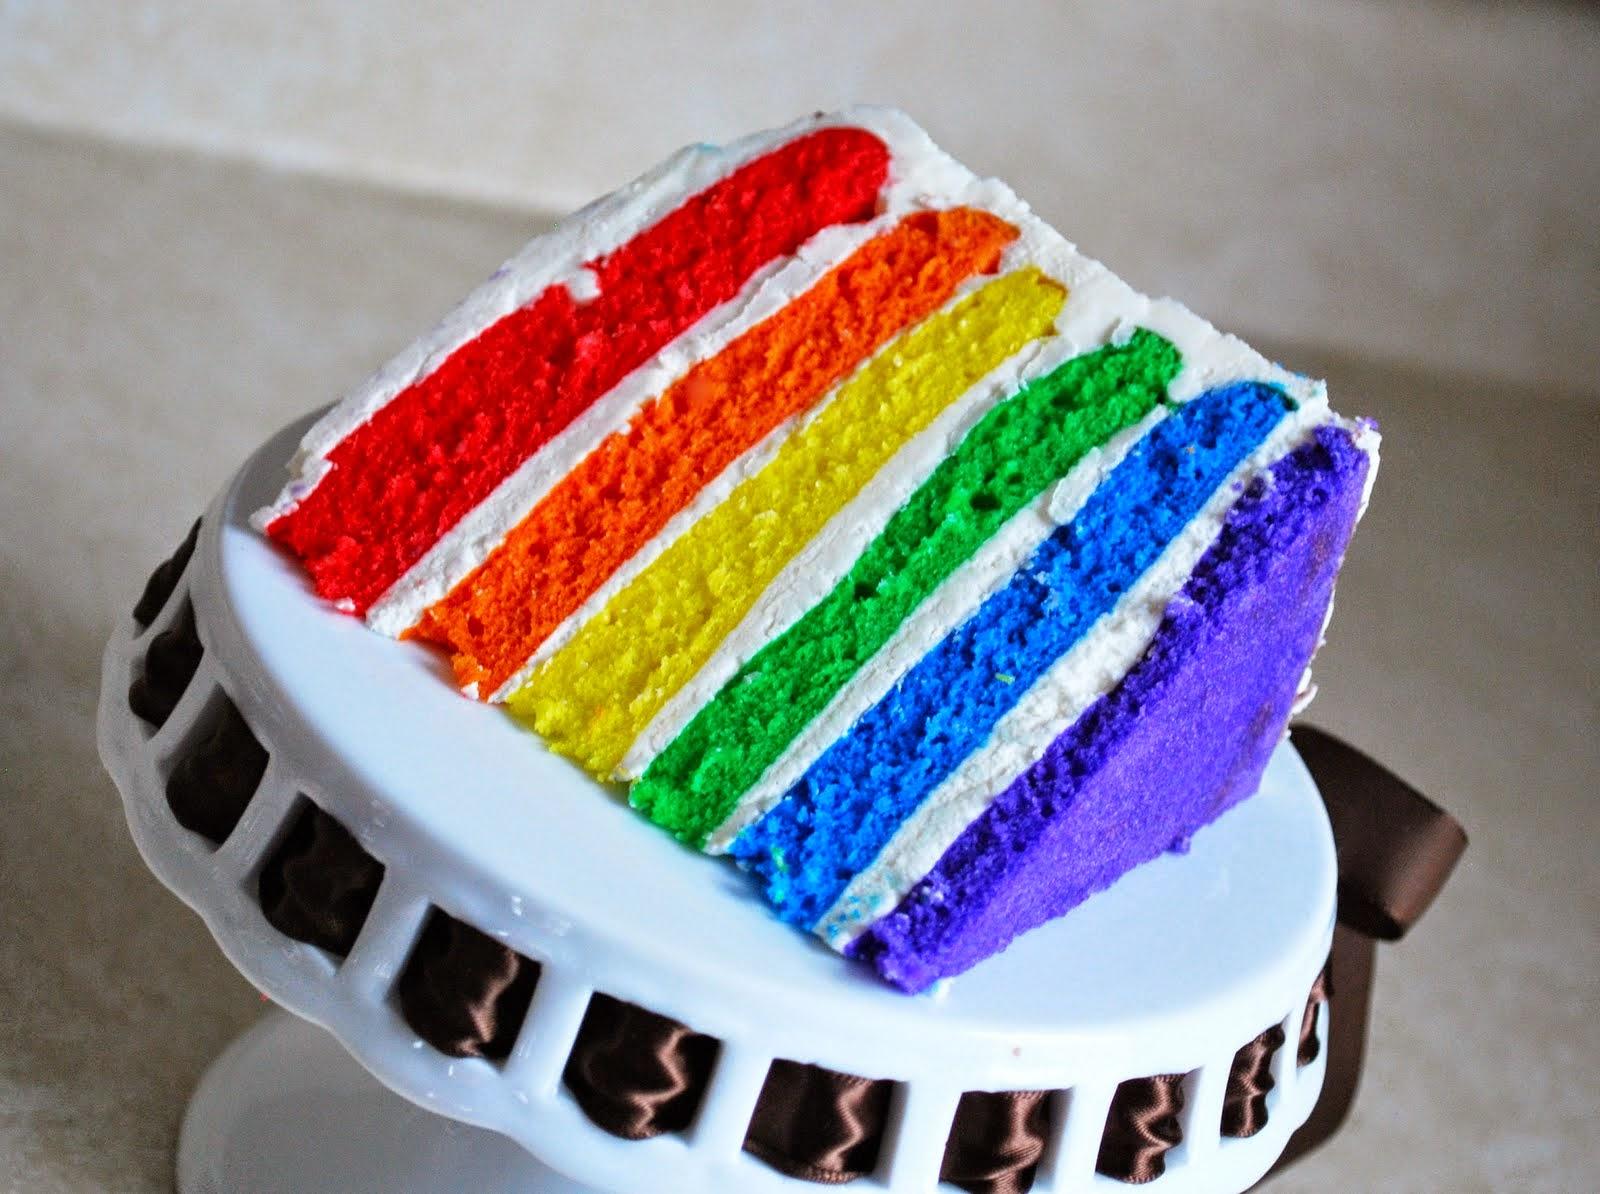 Resep Cake Kukus Yang Lembut: Ajeng Santika: Asal Usul Cake Rainbow